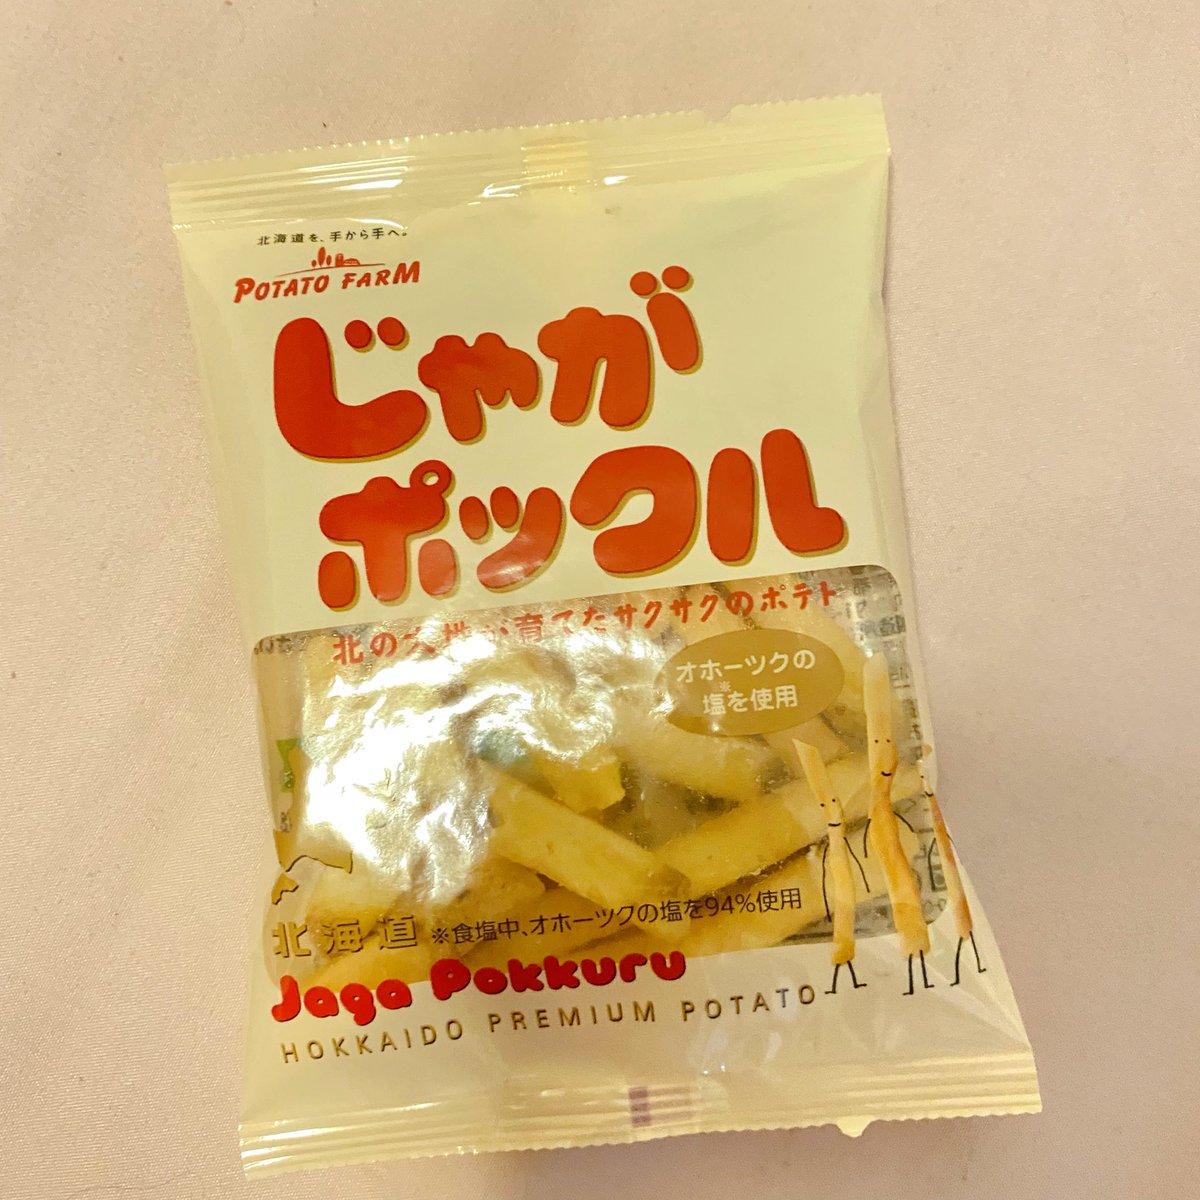 test ツイッターメディア - じゃがポックル (//∇//) ฮื่อออ ไม่ต้องรอไปญี่ปุ่นหรือฝากที่ทำงานซื้อแล้ว ที่สุดความอร่อยของหนมมันฝรั่งที่เป็นแท่ง เป็นชิ้นเป็นอัน ไม่ใช่วิญญาณมันฝรั่ง ไม่ได้เดี๋ยวไม่เป็นไร ต้องได้กินก่อน โคตรอร่อย กล่องนึงหมดเร็วมาก https://t.co/opDrmbfHg0